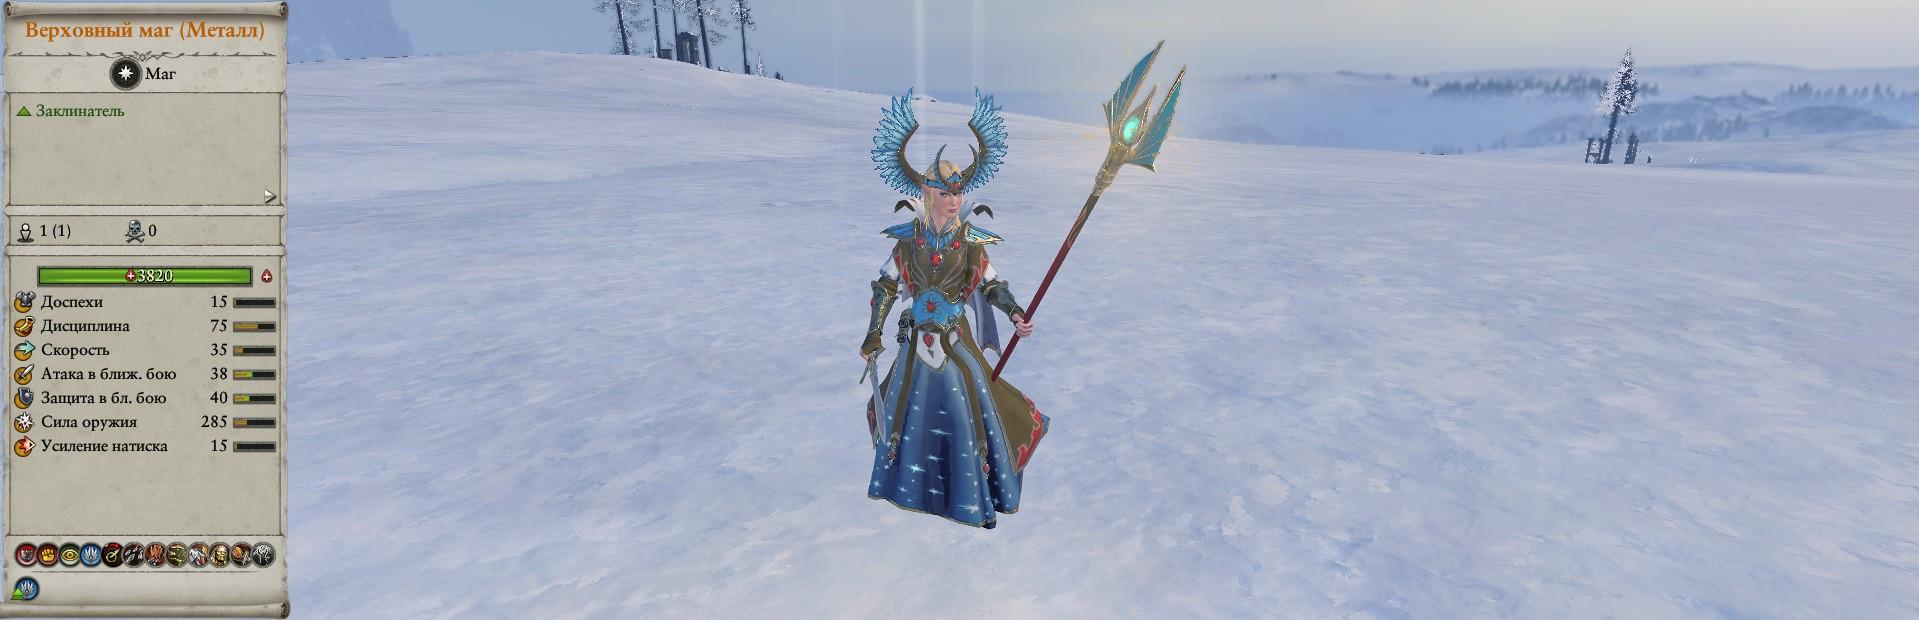 Верховный маг отряды warhammer total war 2